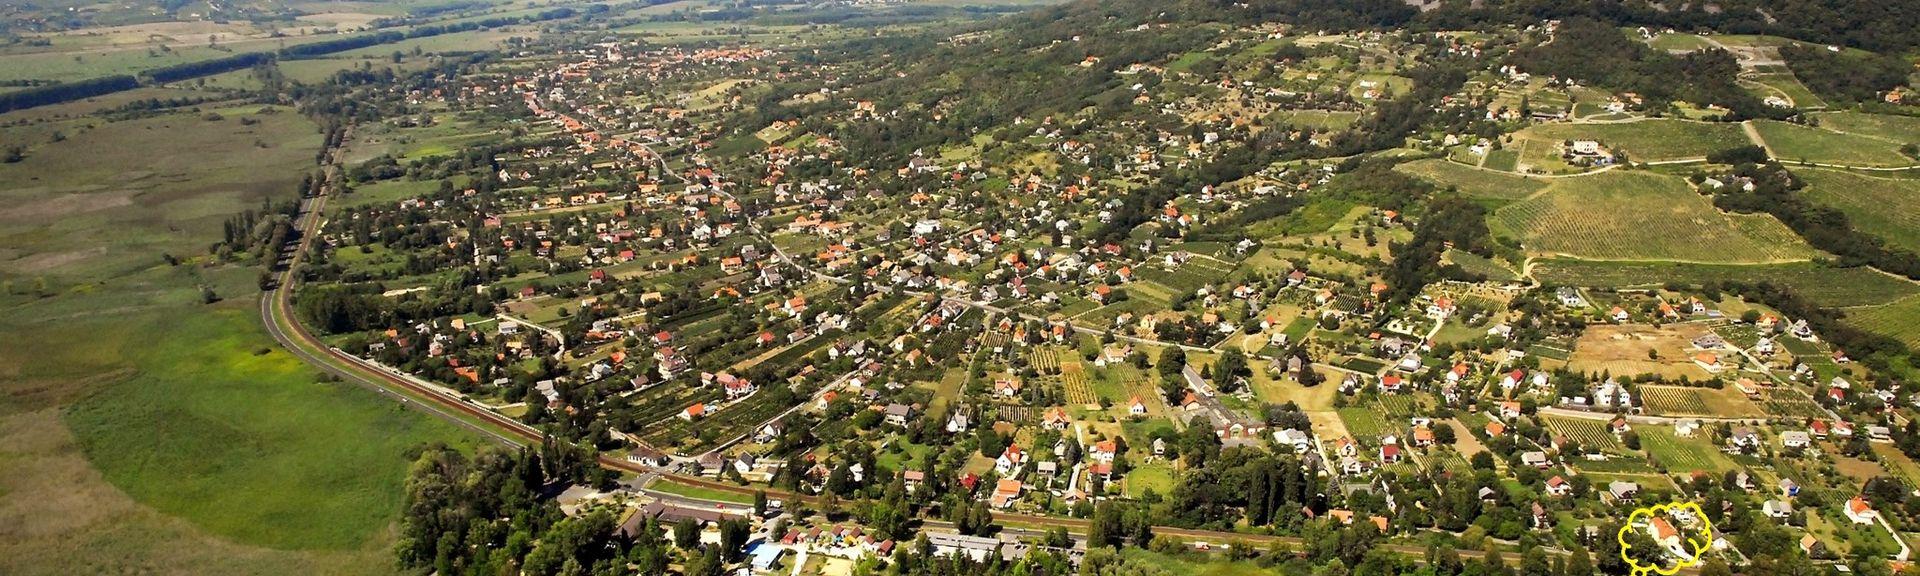 Balatonlelle Felso Station, Balatonlelle, Somogy County, Hungary